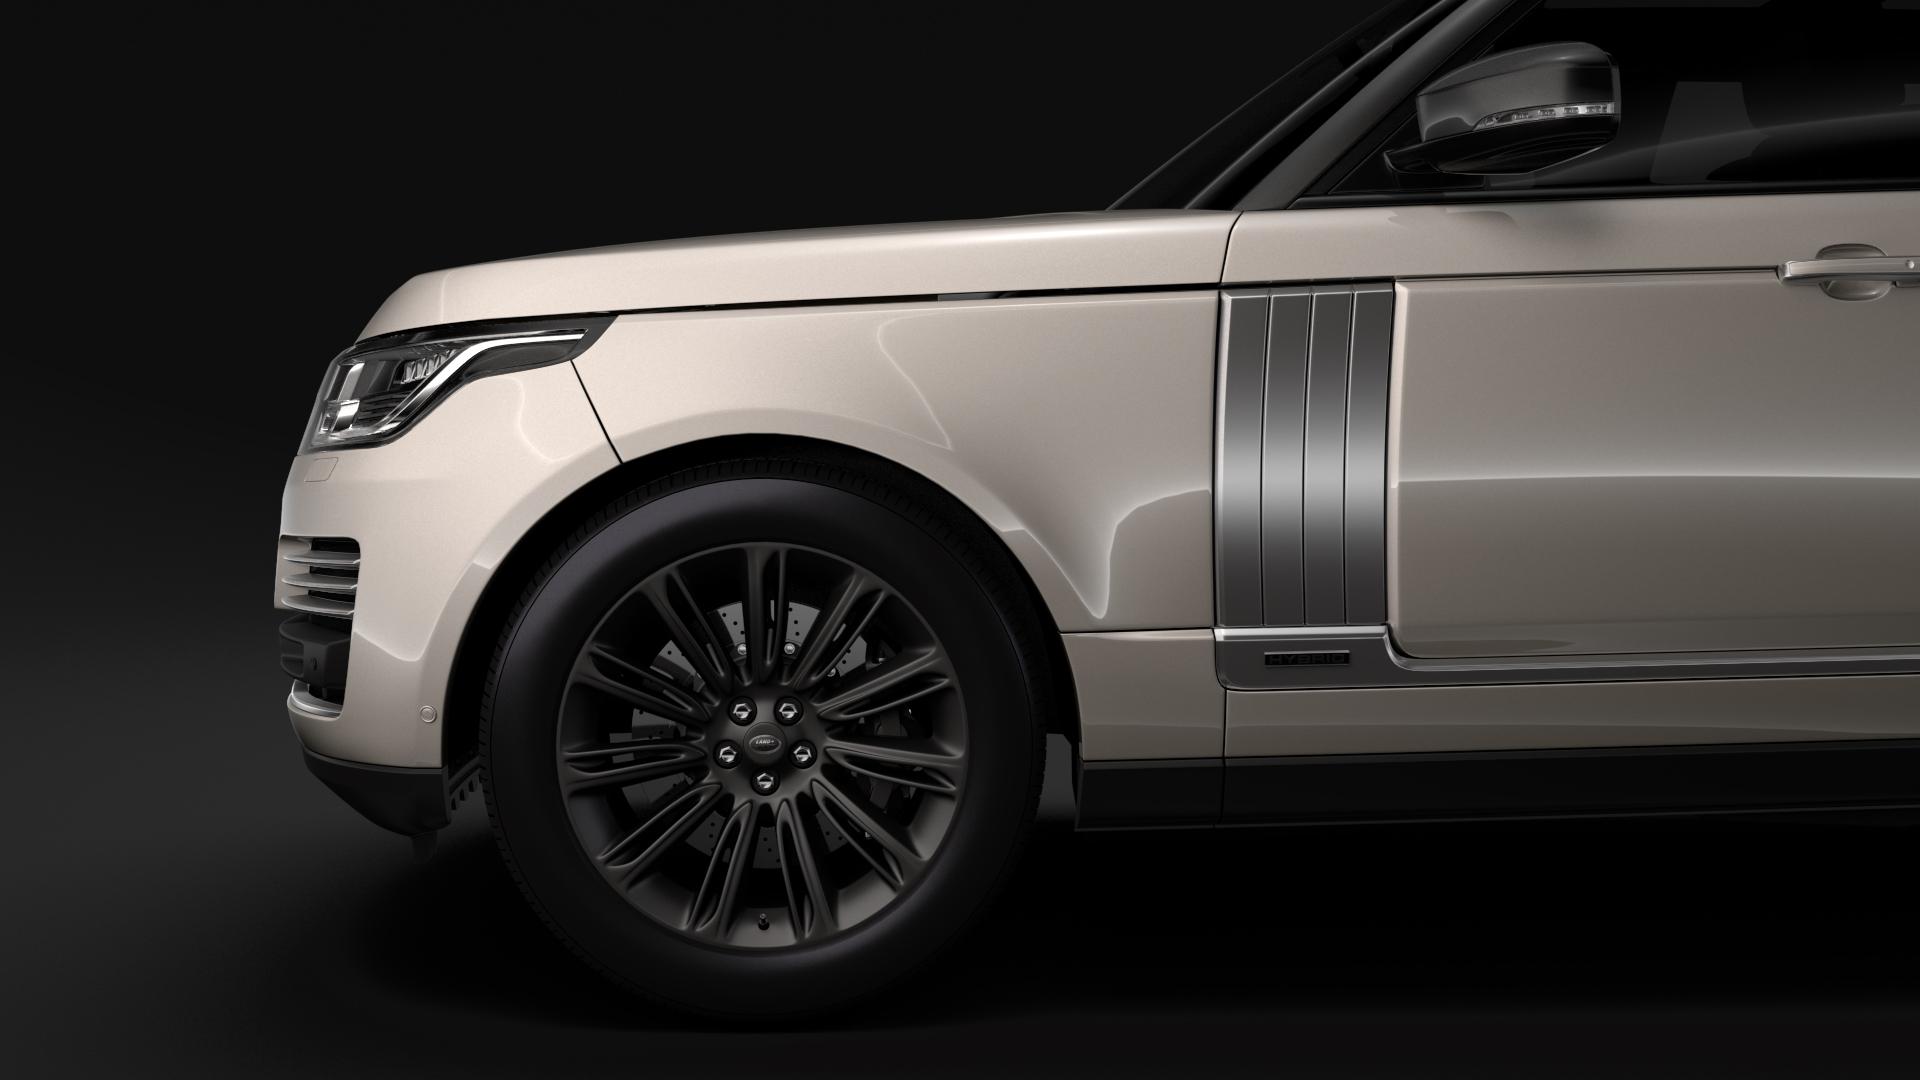 range rover autobiography hybrid lwb l405 2018 3d model max fbx c4d lwo ma mb hrc xsi obj 277302